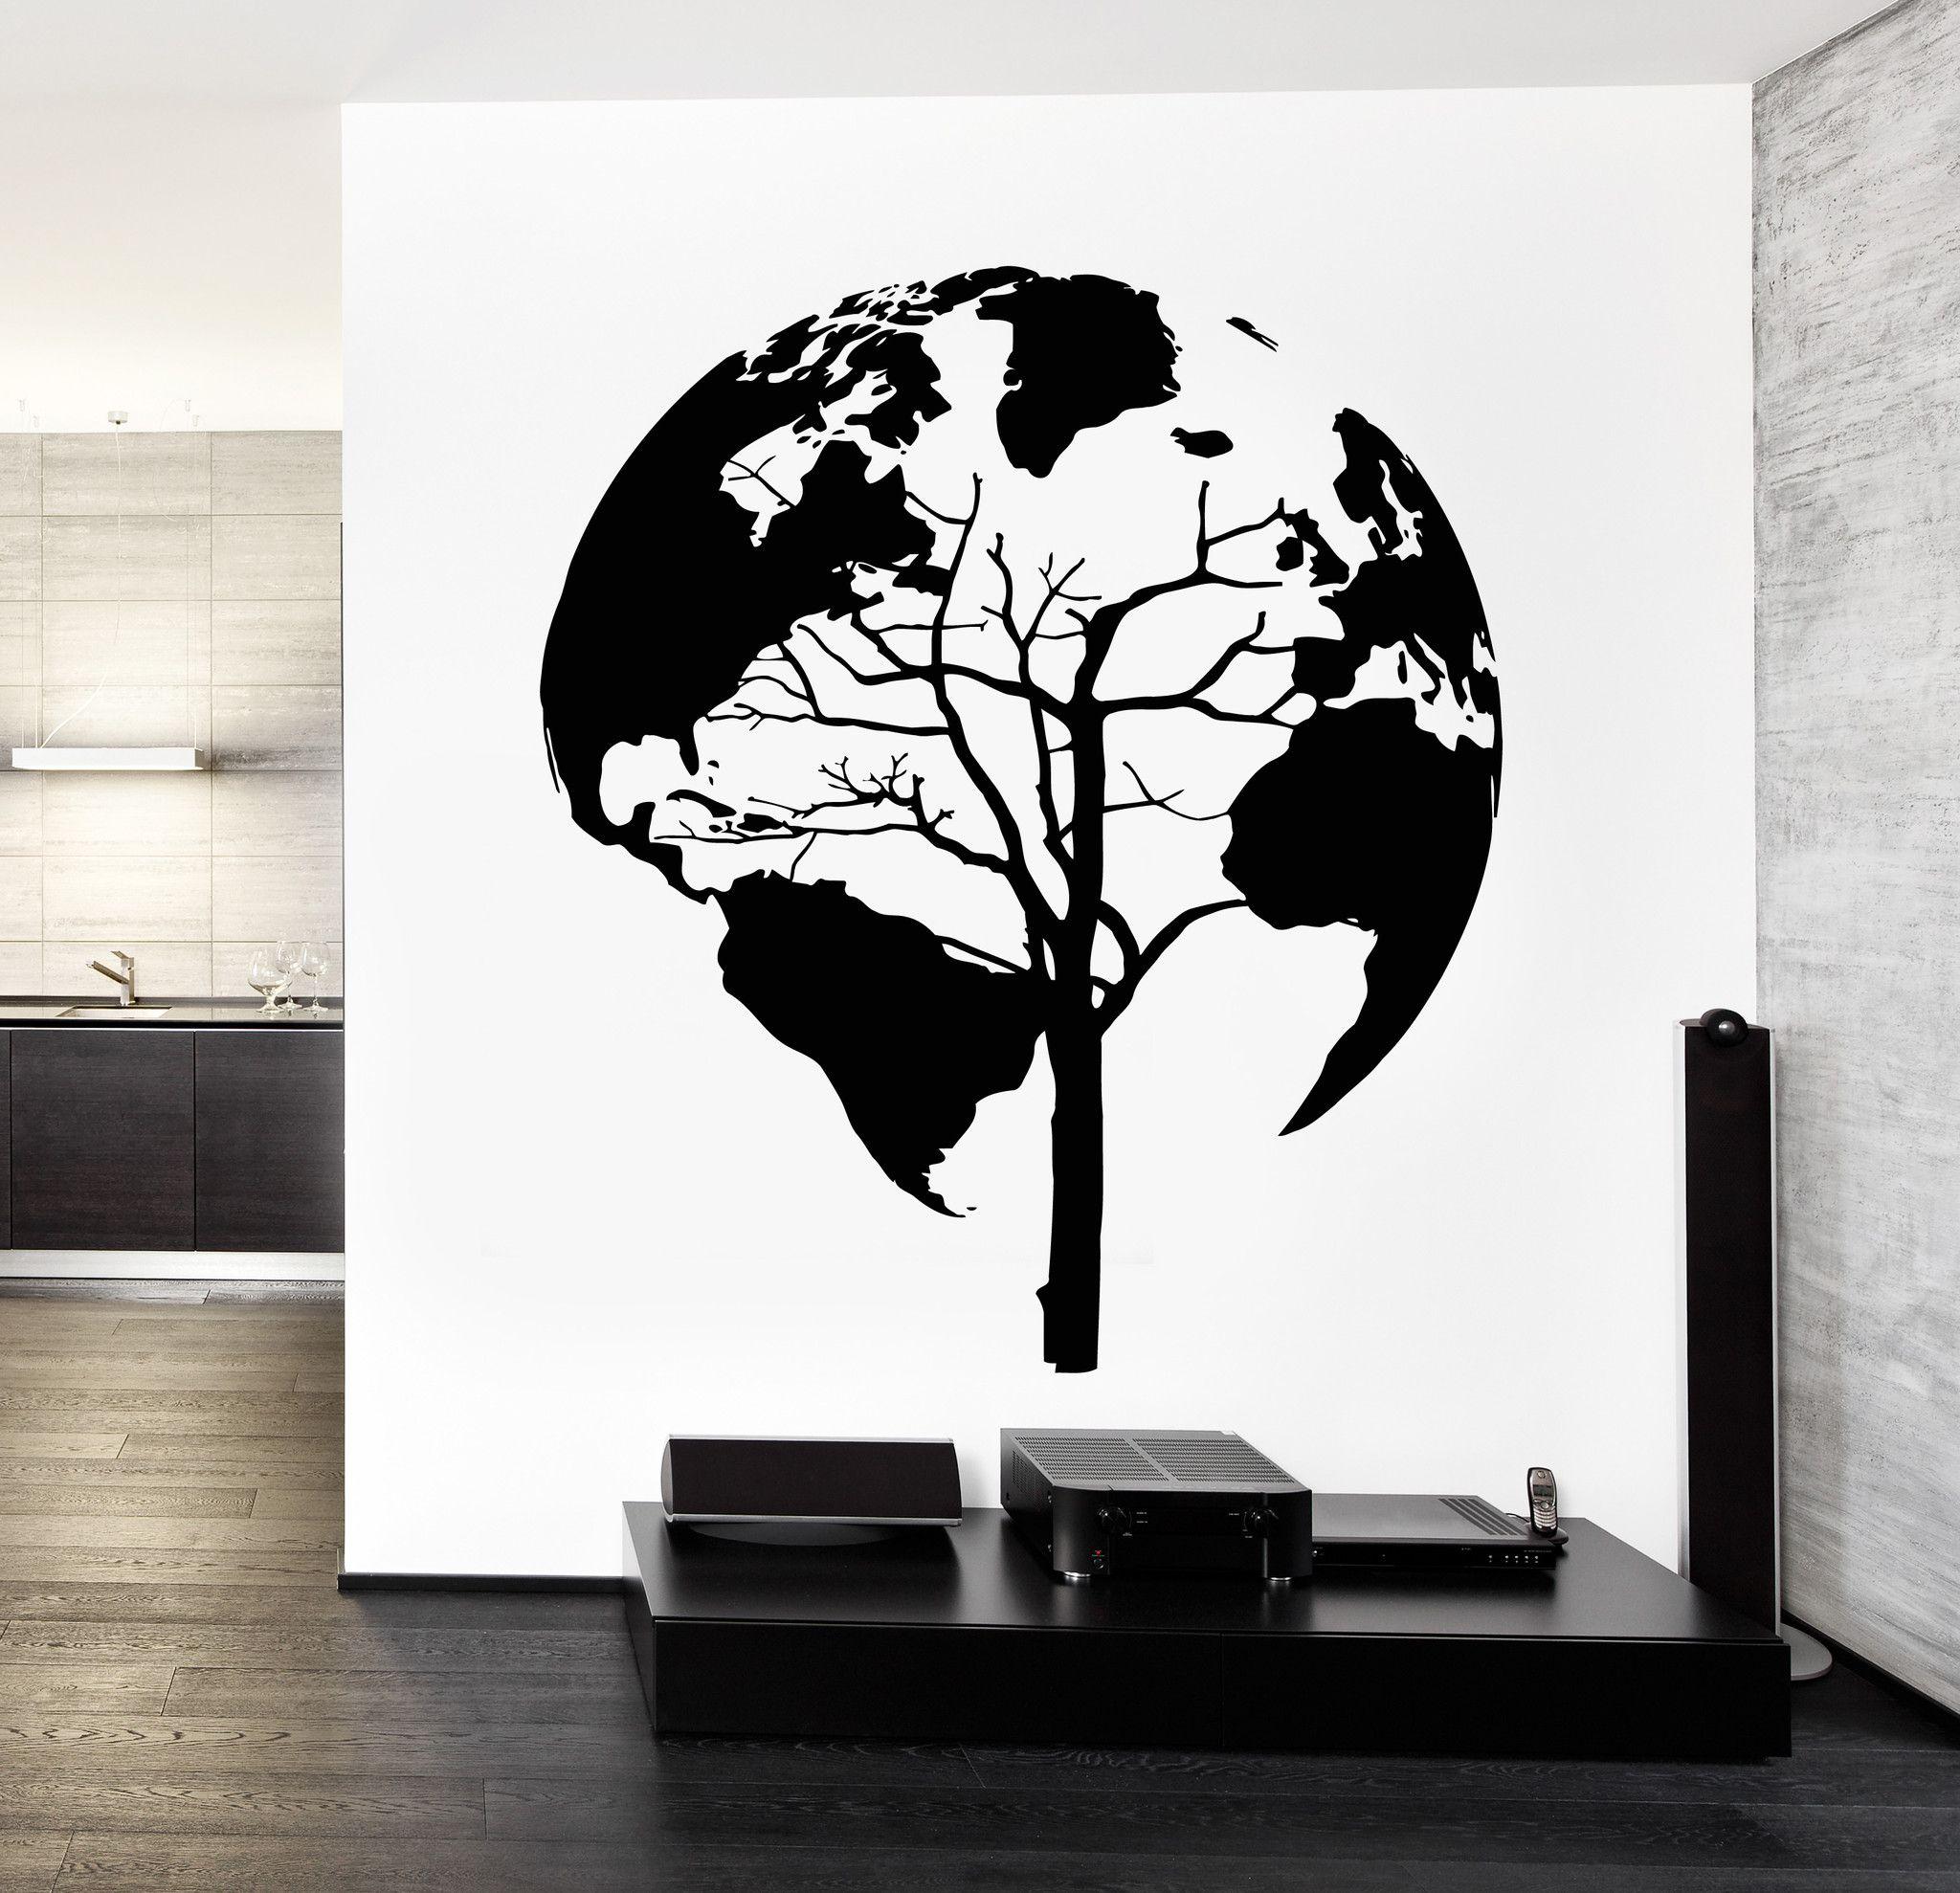 Wall Decal World Map Tree Cool Vinyl Sticker Z3248